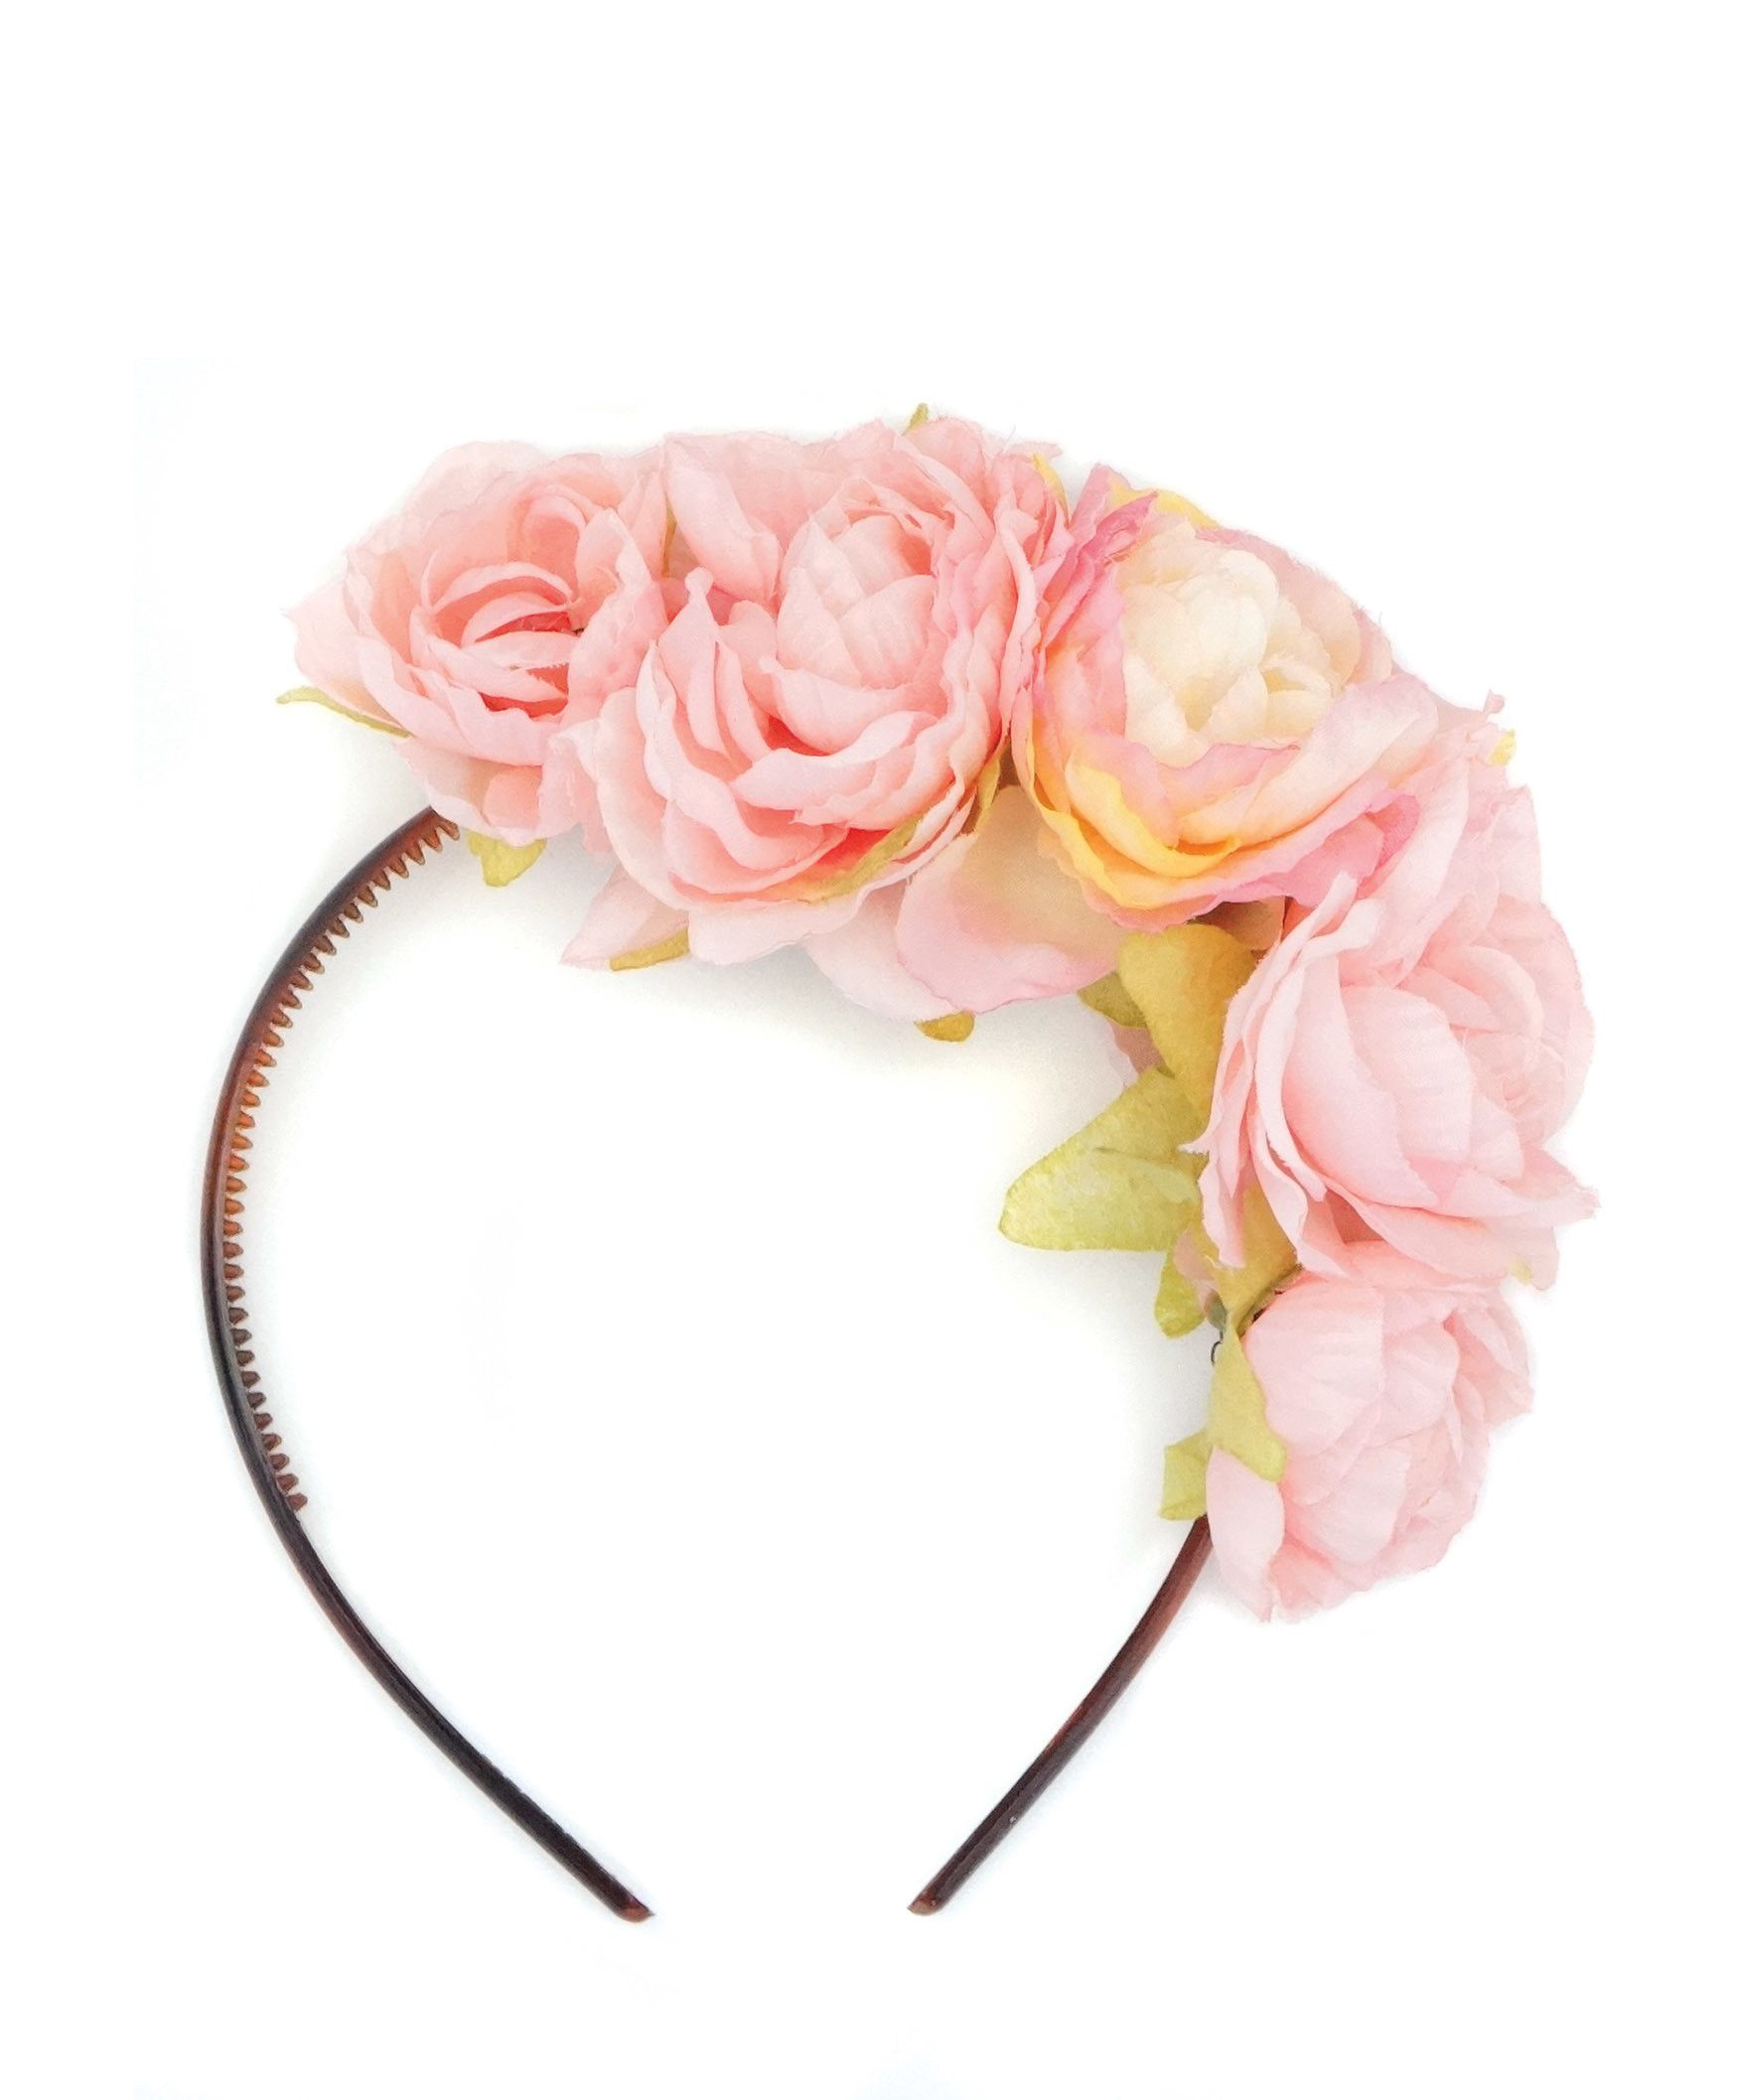 Faux flower headband faux flowers flower headbands and flower crowns faux flower headband izmirmasajfo